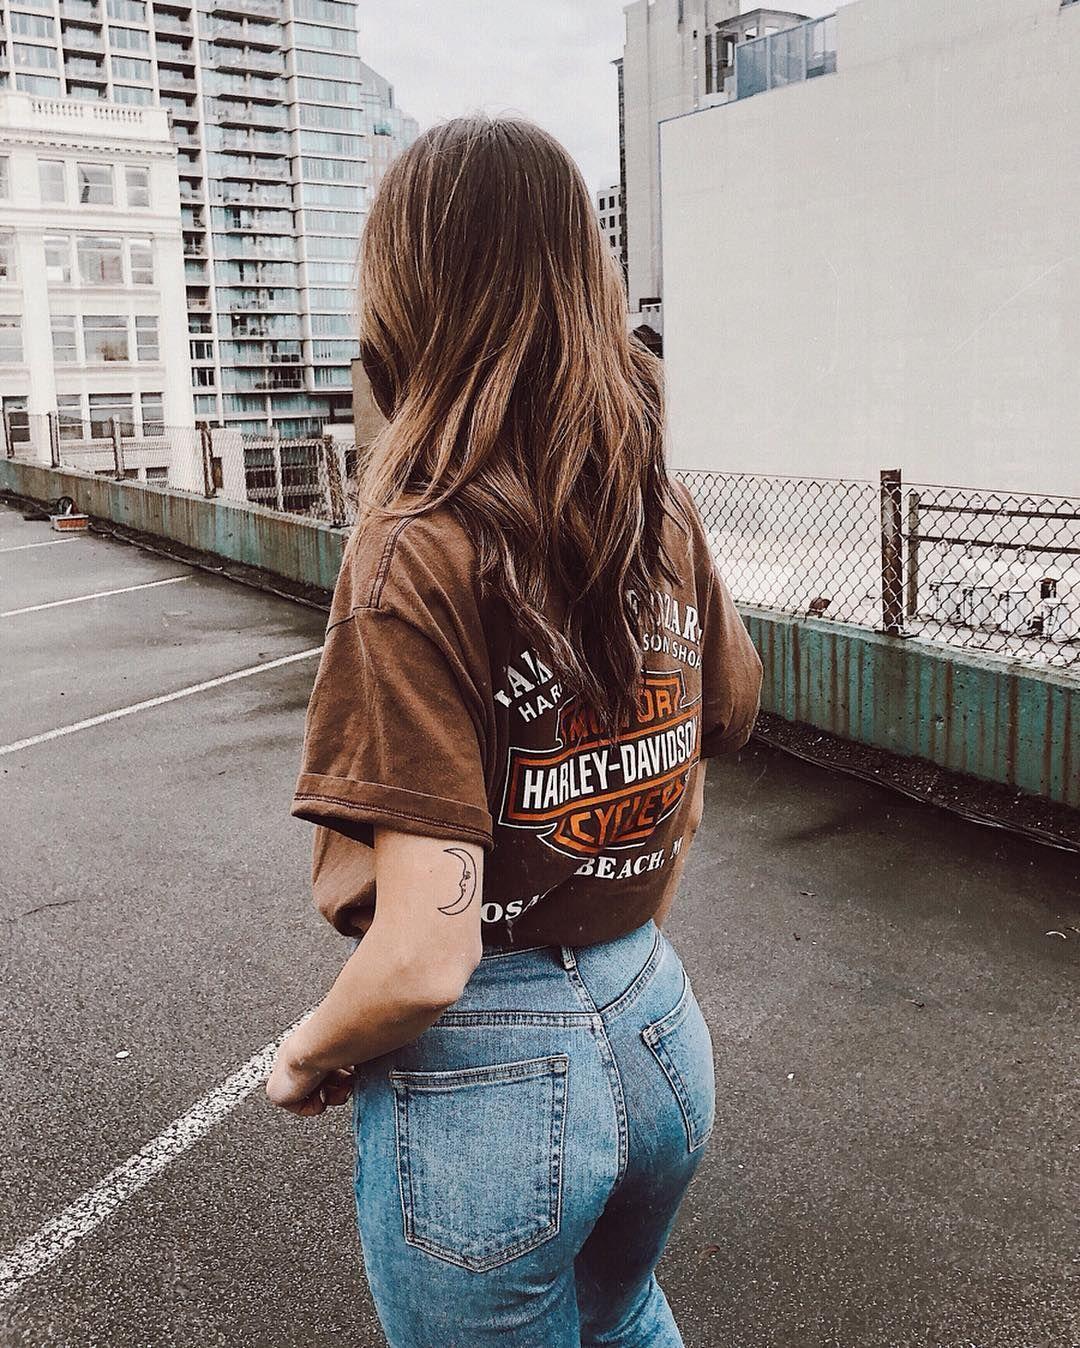 Vintage Tee Jeans Vintage Harley Davidson Shirt Harley Davidson Shirt Harley Shirts